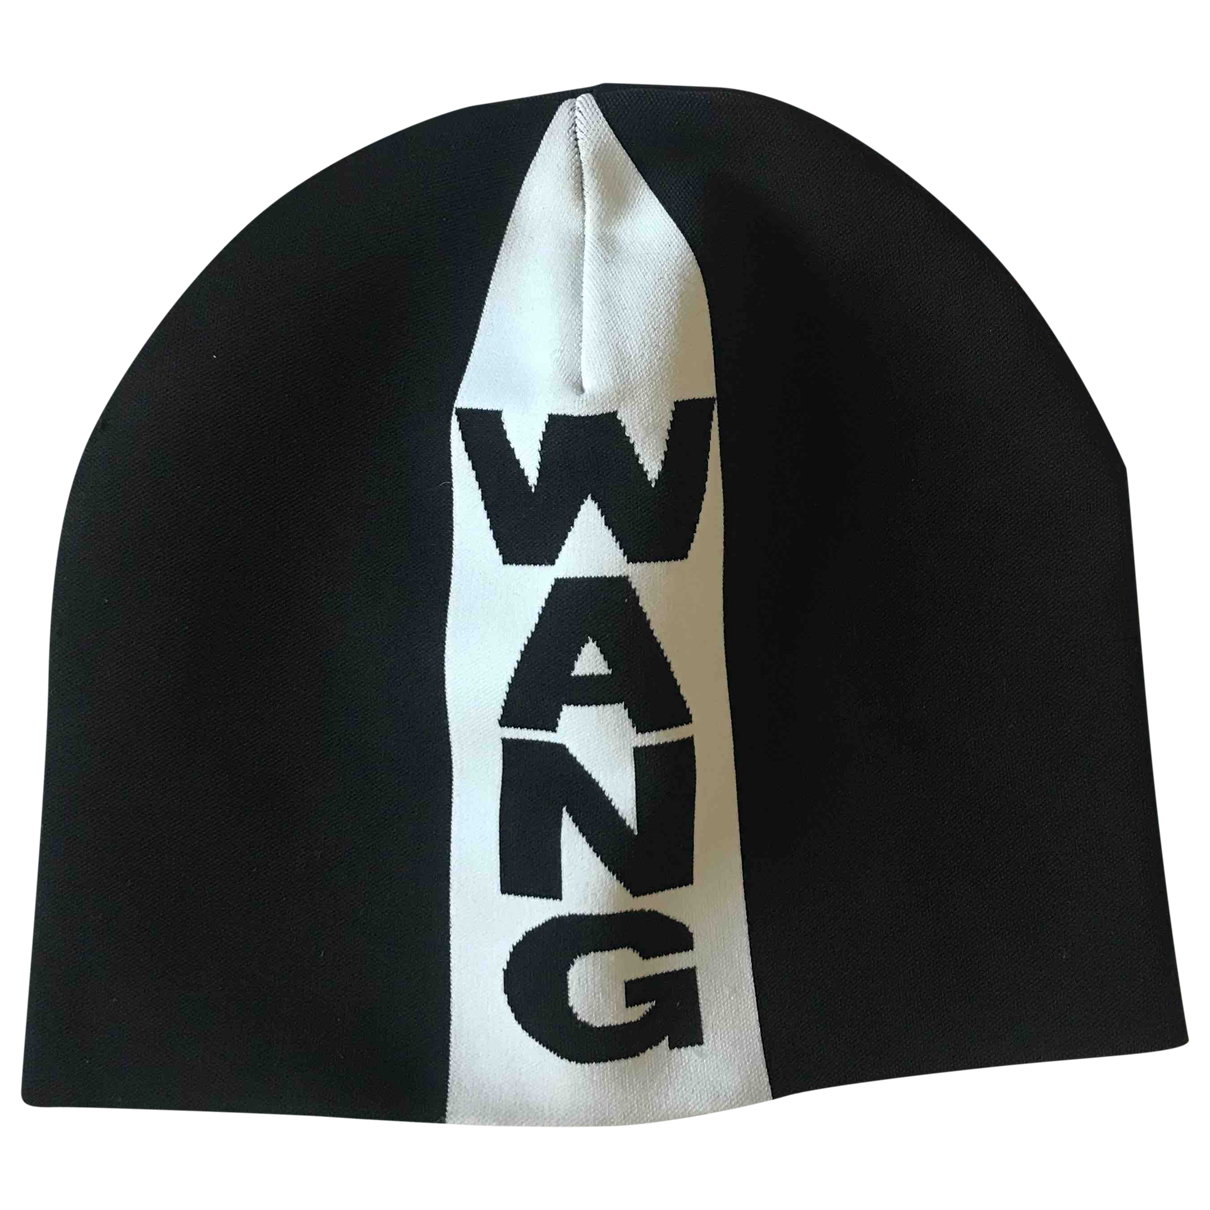 Alexander Wang Pour H&m \N Black hat for Women M International